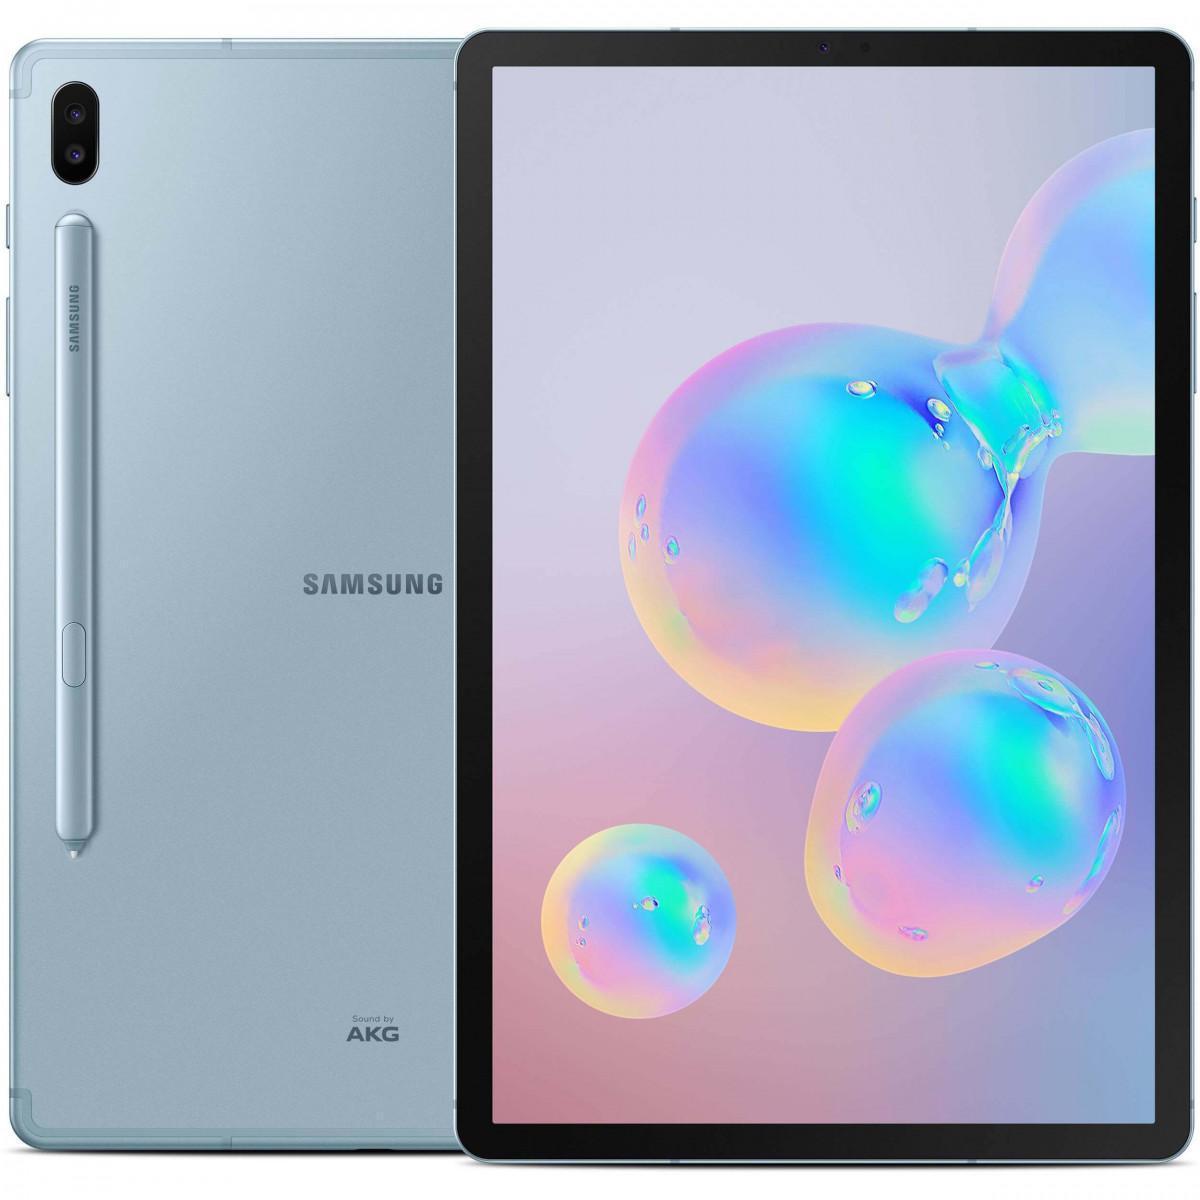 Samsung объявила о старте продаж планшета Galaxy Tab S6 5G